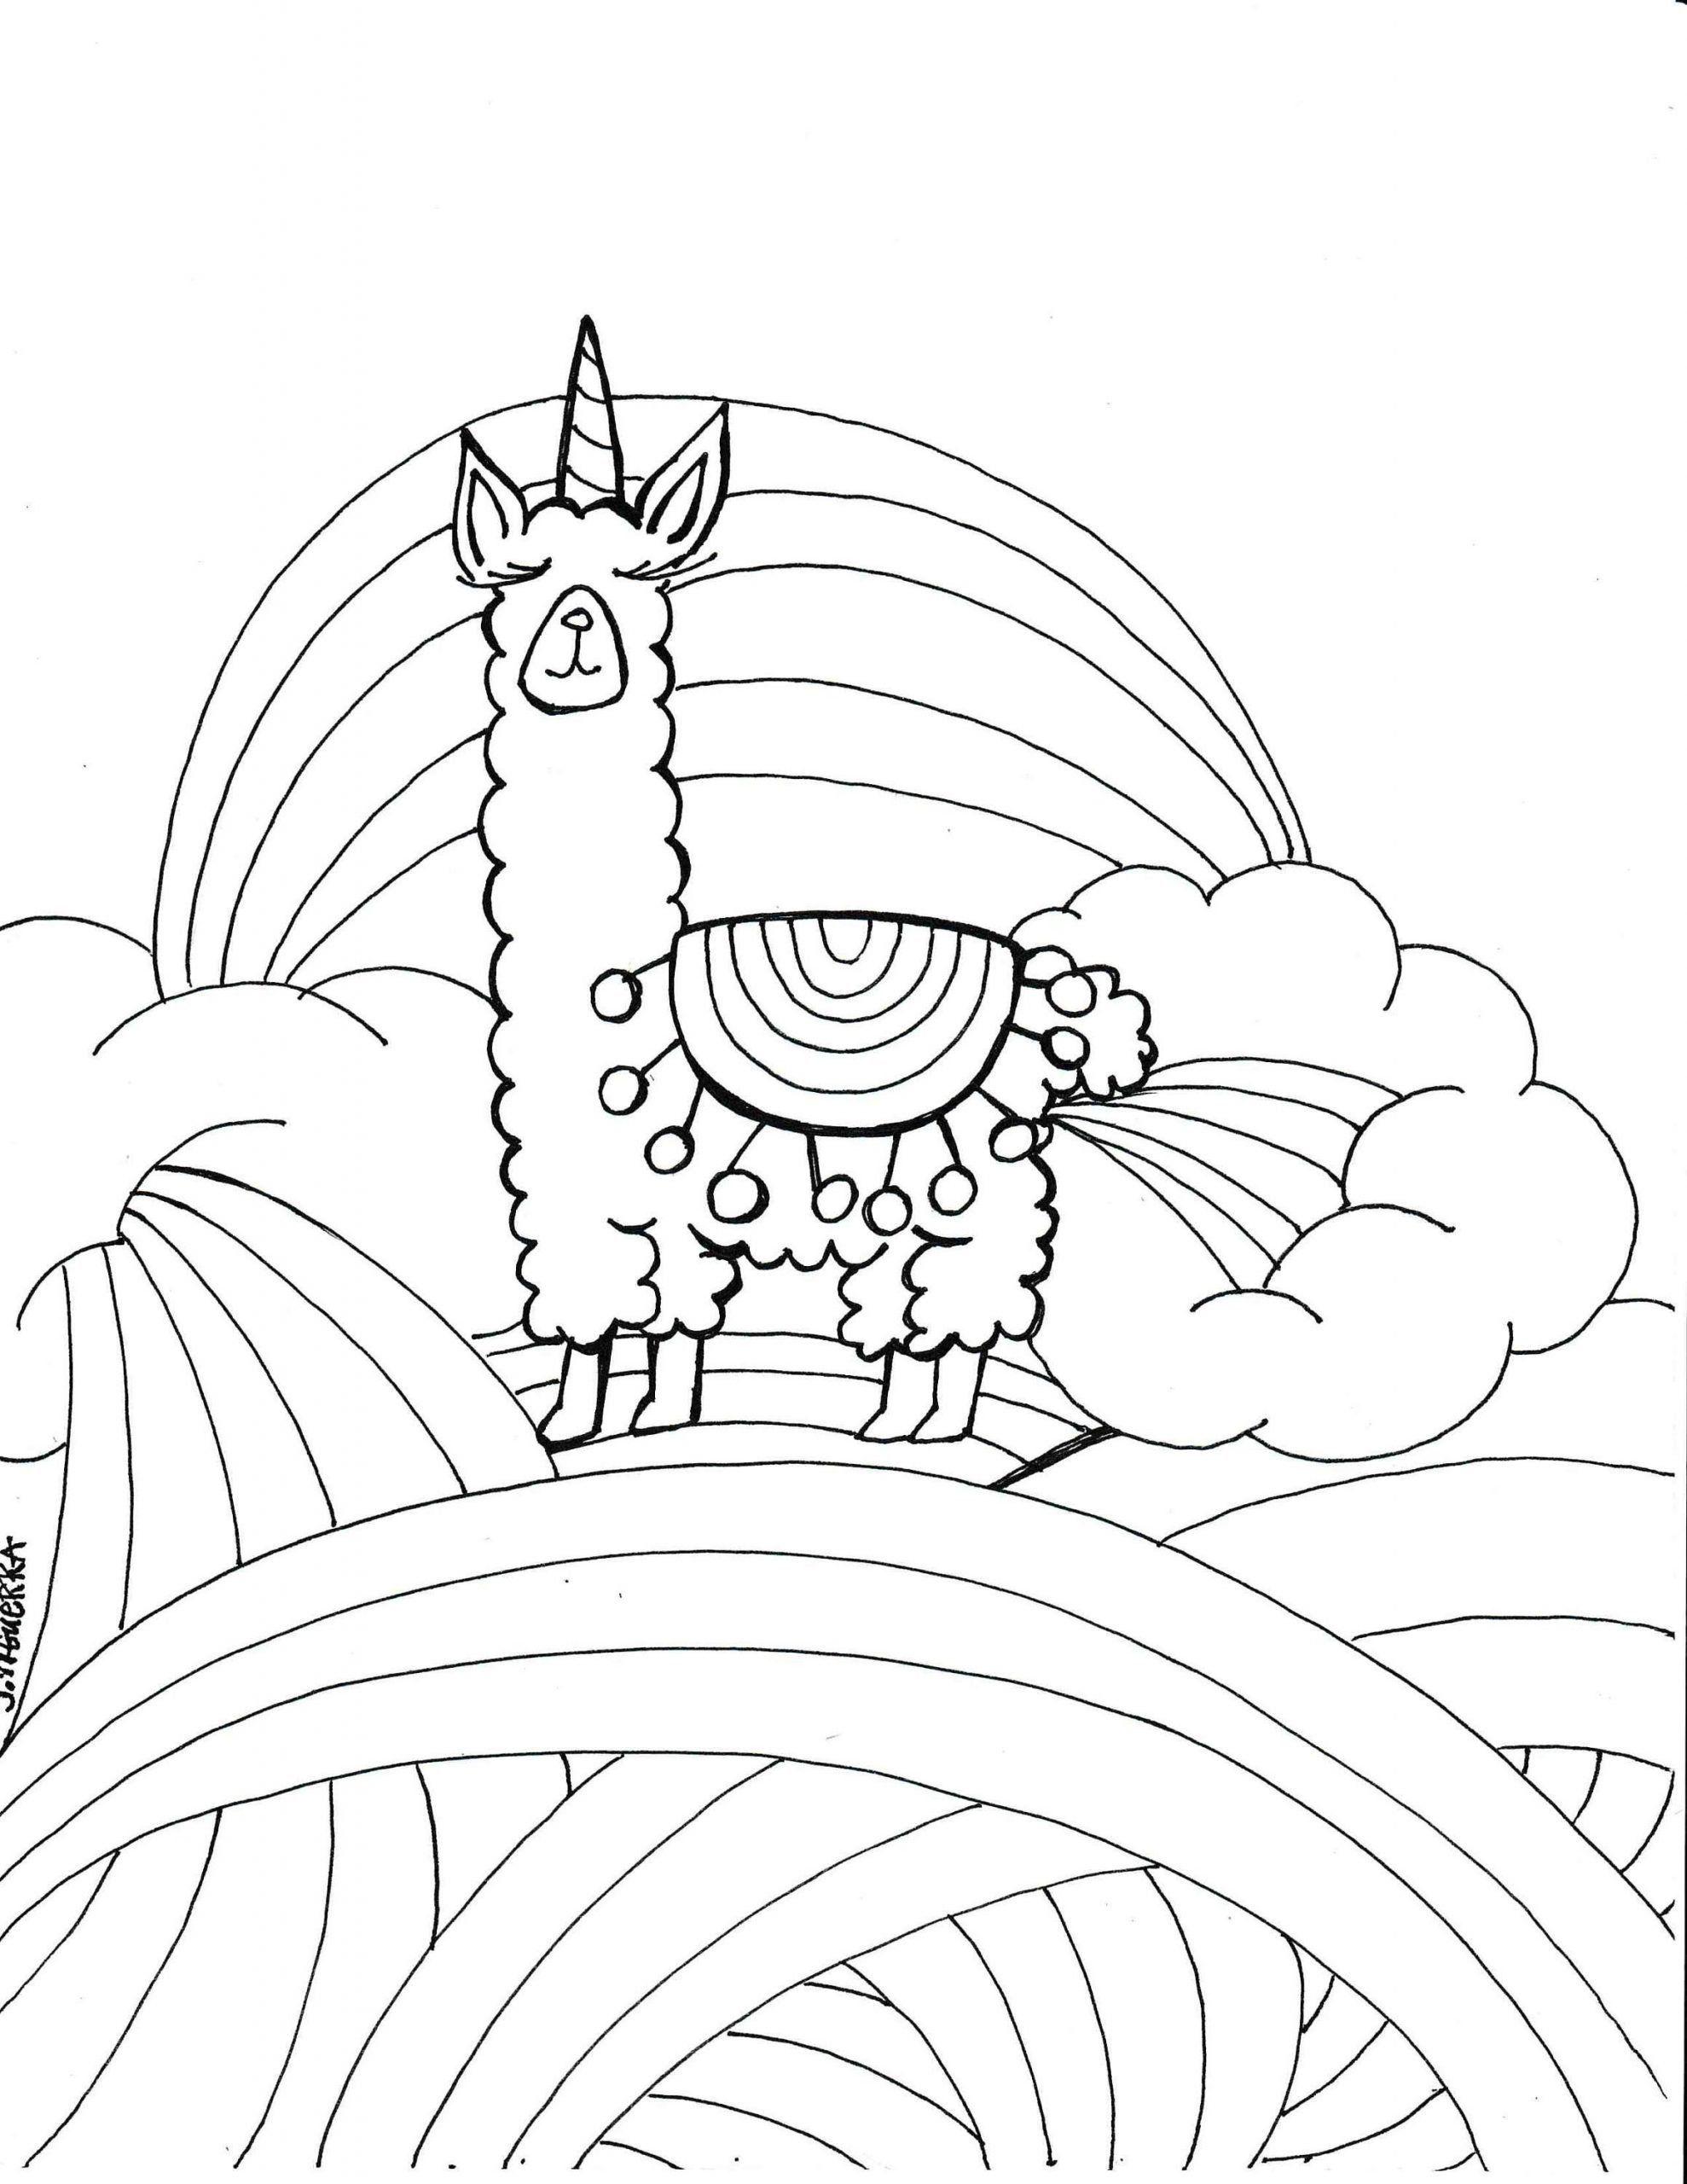 Printable Mandala Coloring Pages Pdf Coloring Pages Pdf Milano Danapardaz In 2020 Cartoon Coloring Pages Animal Coloring Pages Pokemon Coloring Pages